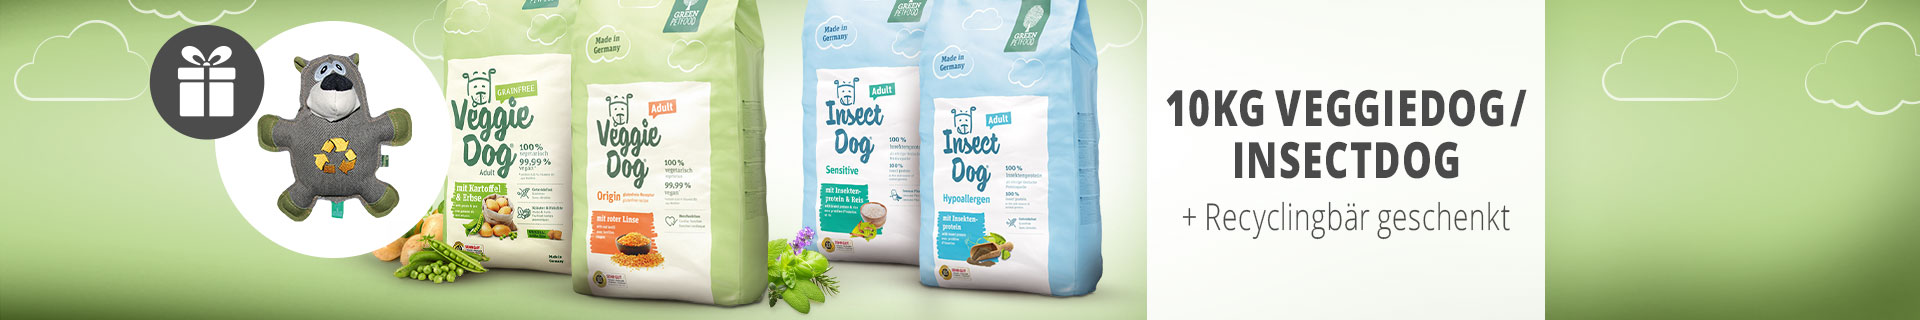 VeggieDog/InsectDog + Recyclingbär geschenkt (Josera)